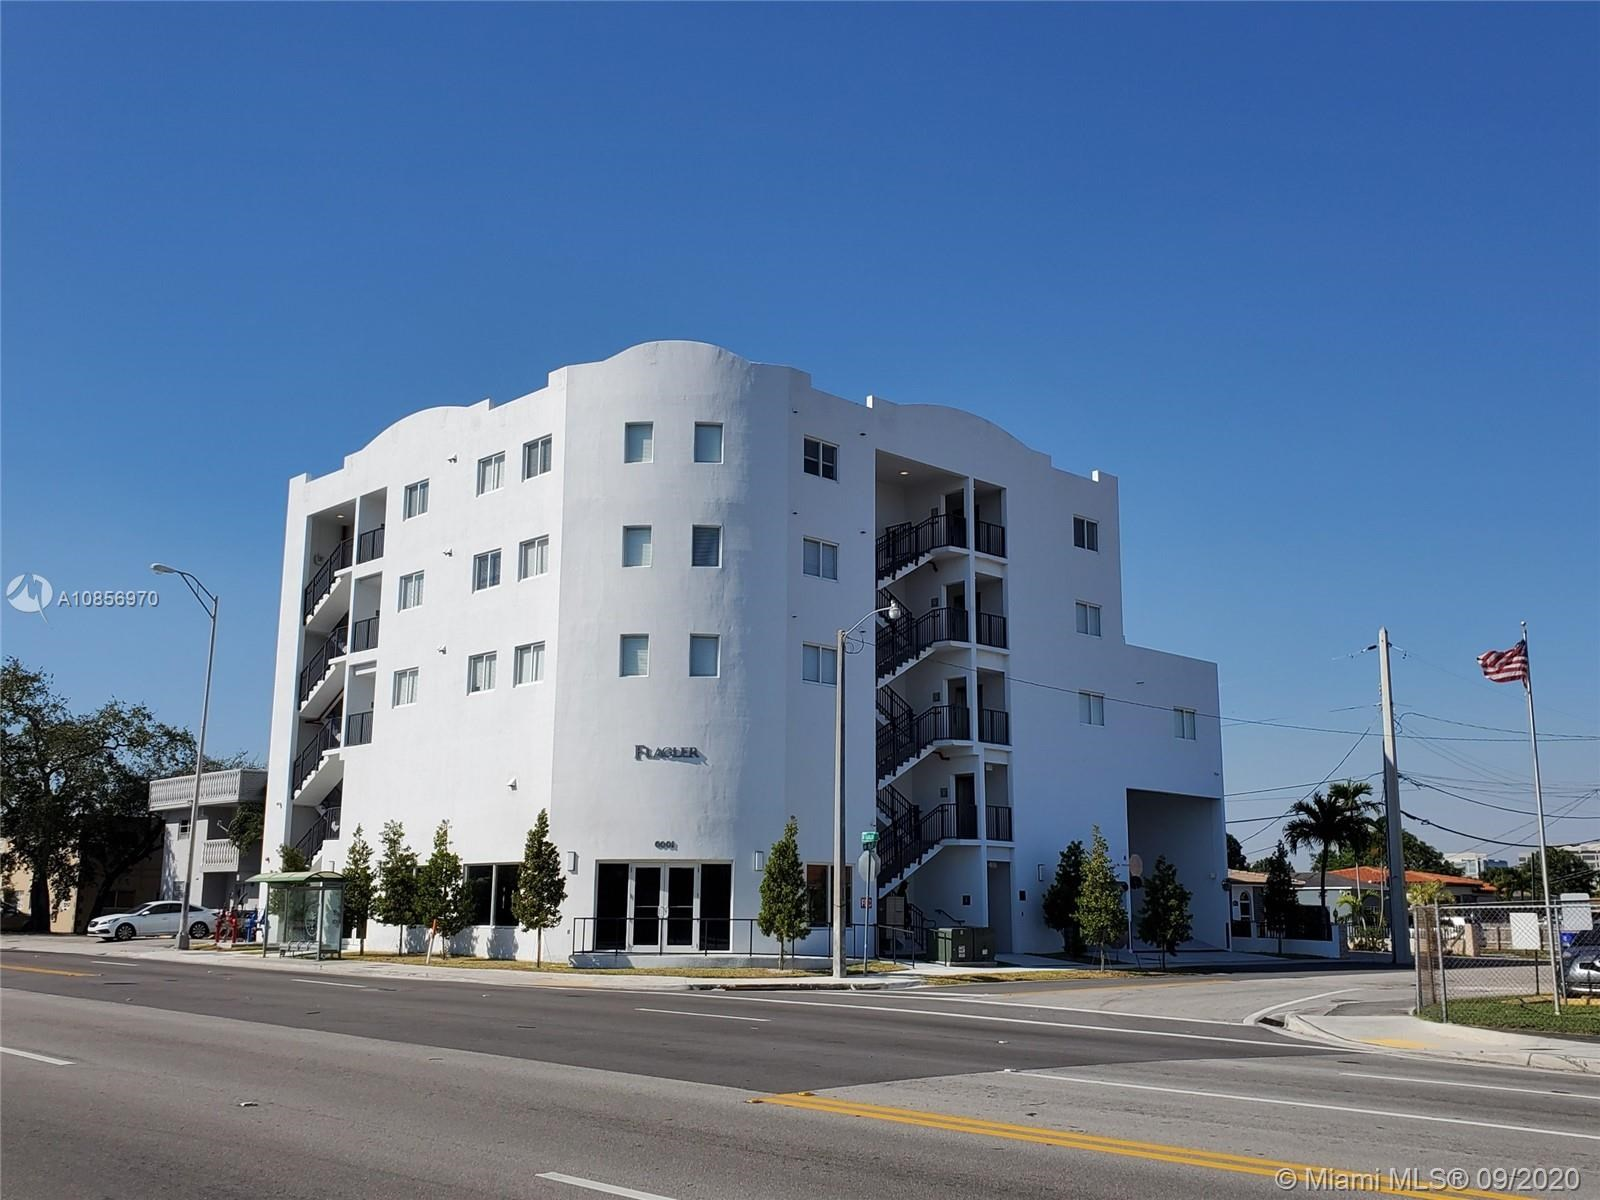 6001 W Flagler St, Miami, FL 33144